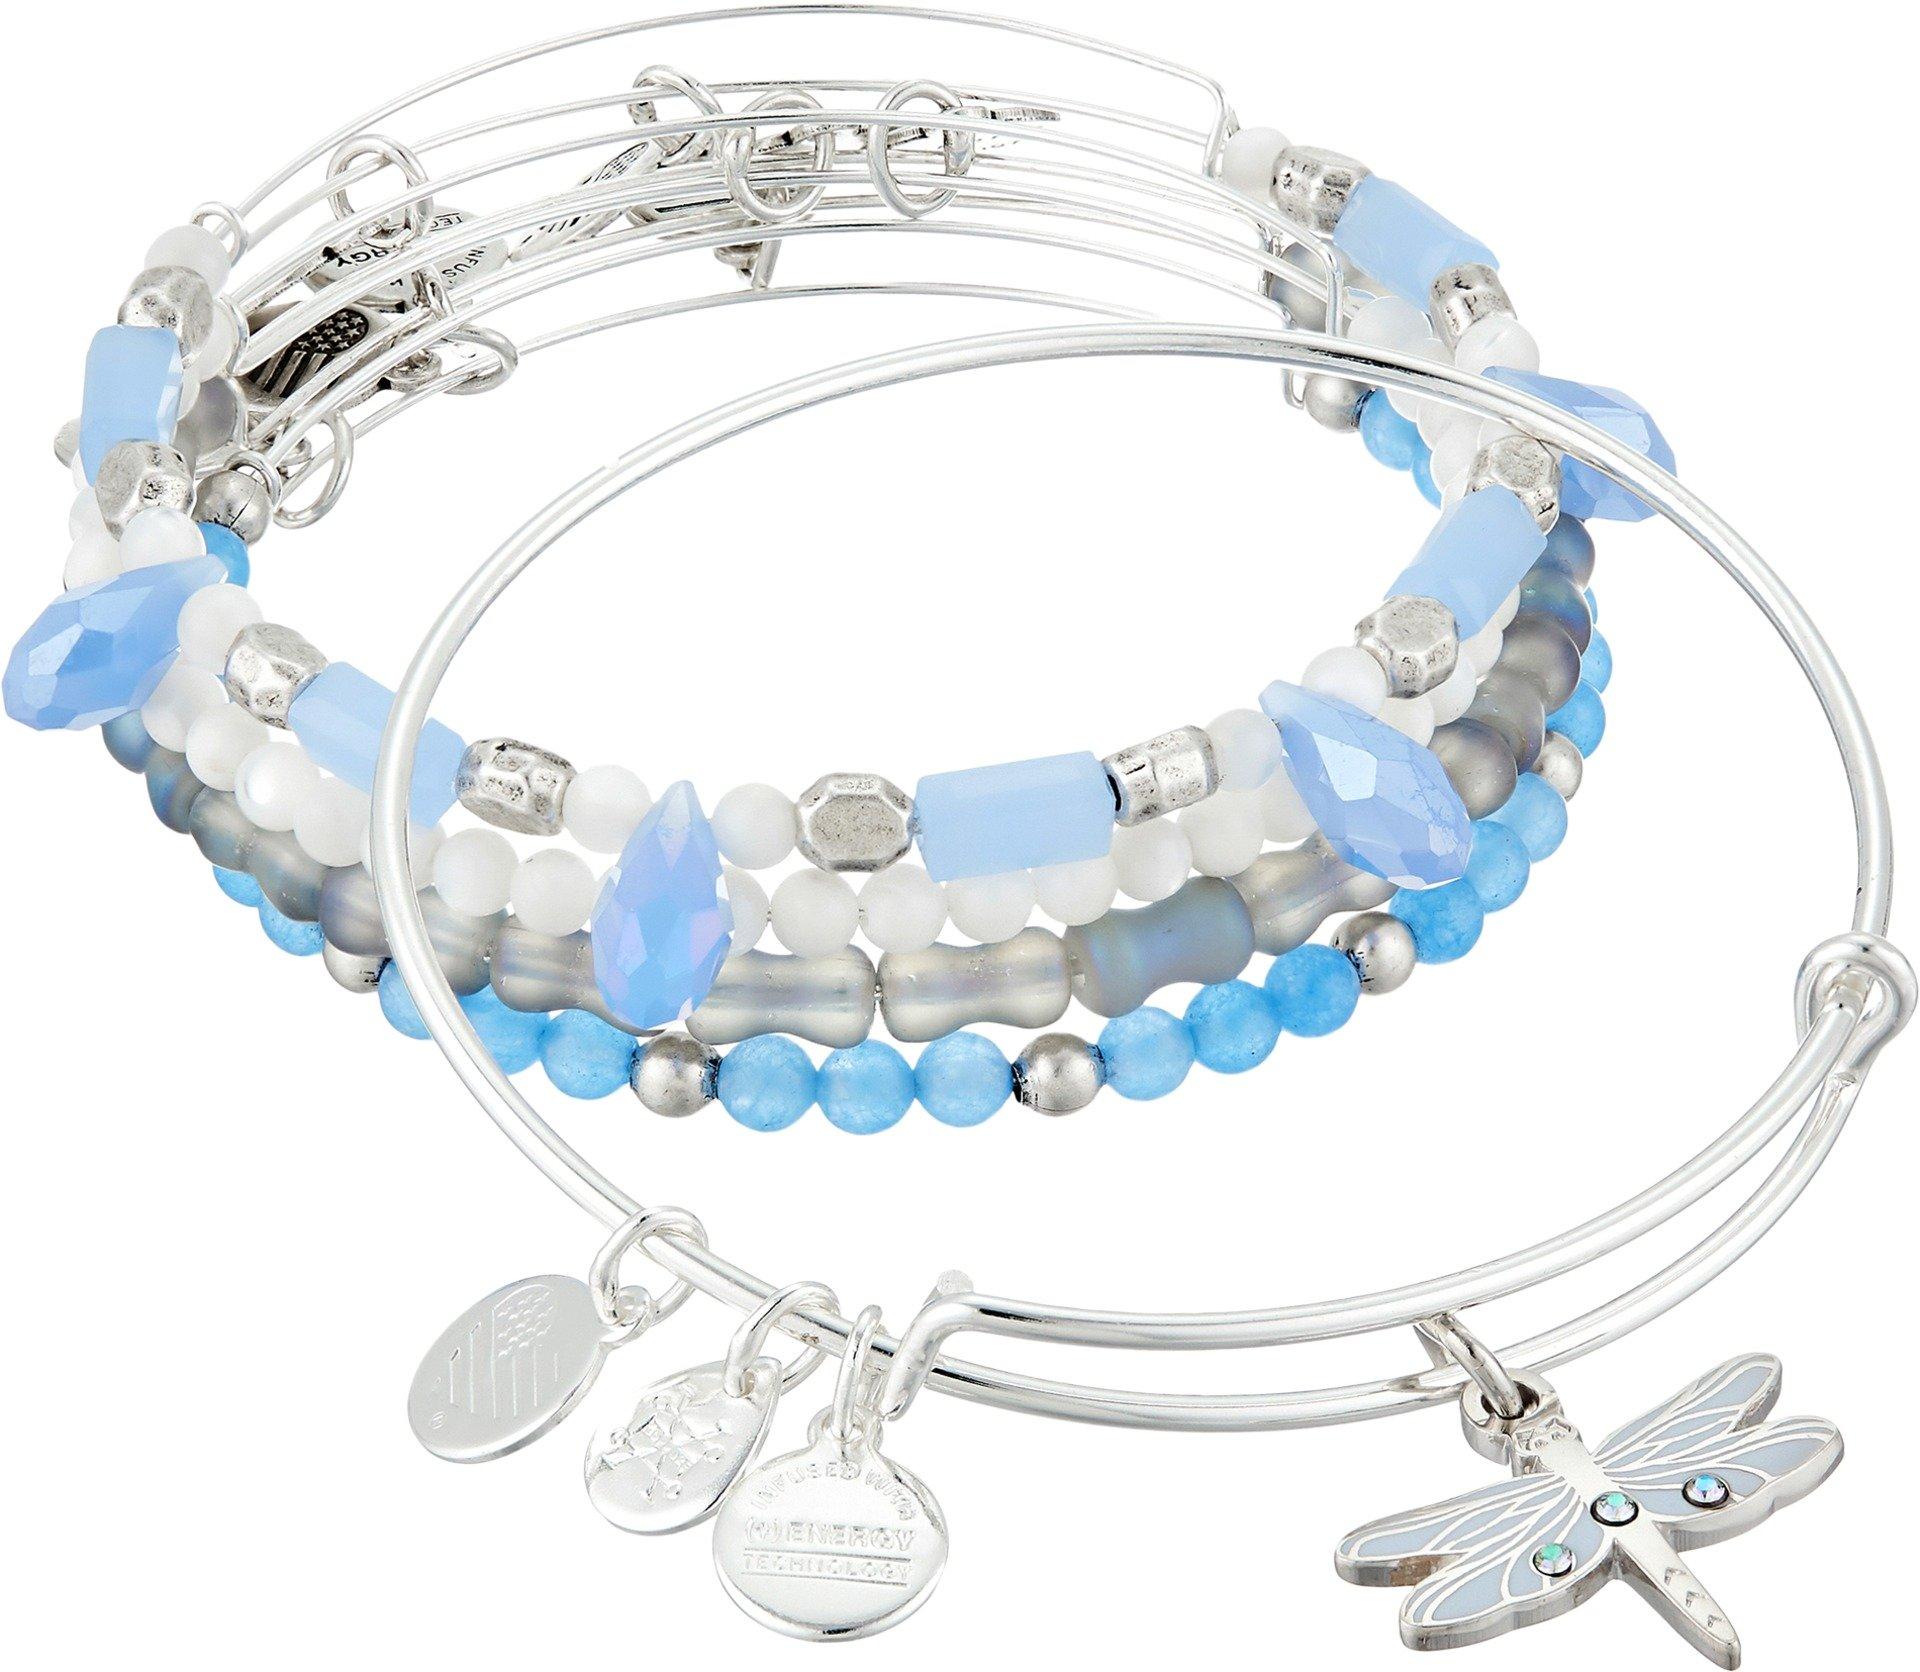 Alex and Ani Dragonfly Set of 5 Rafaelian Silver Bangle Bracelet